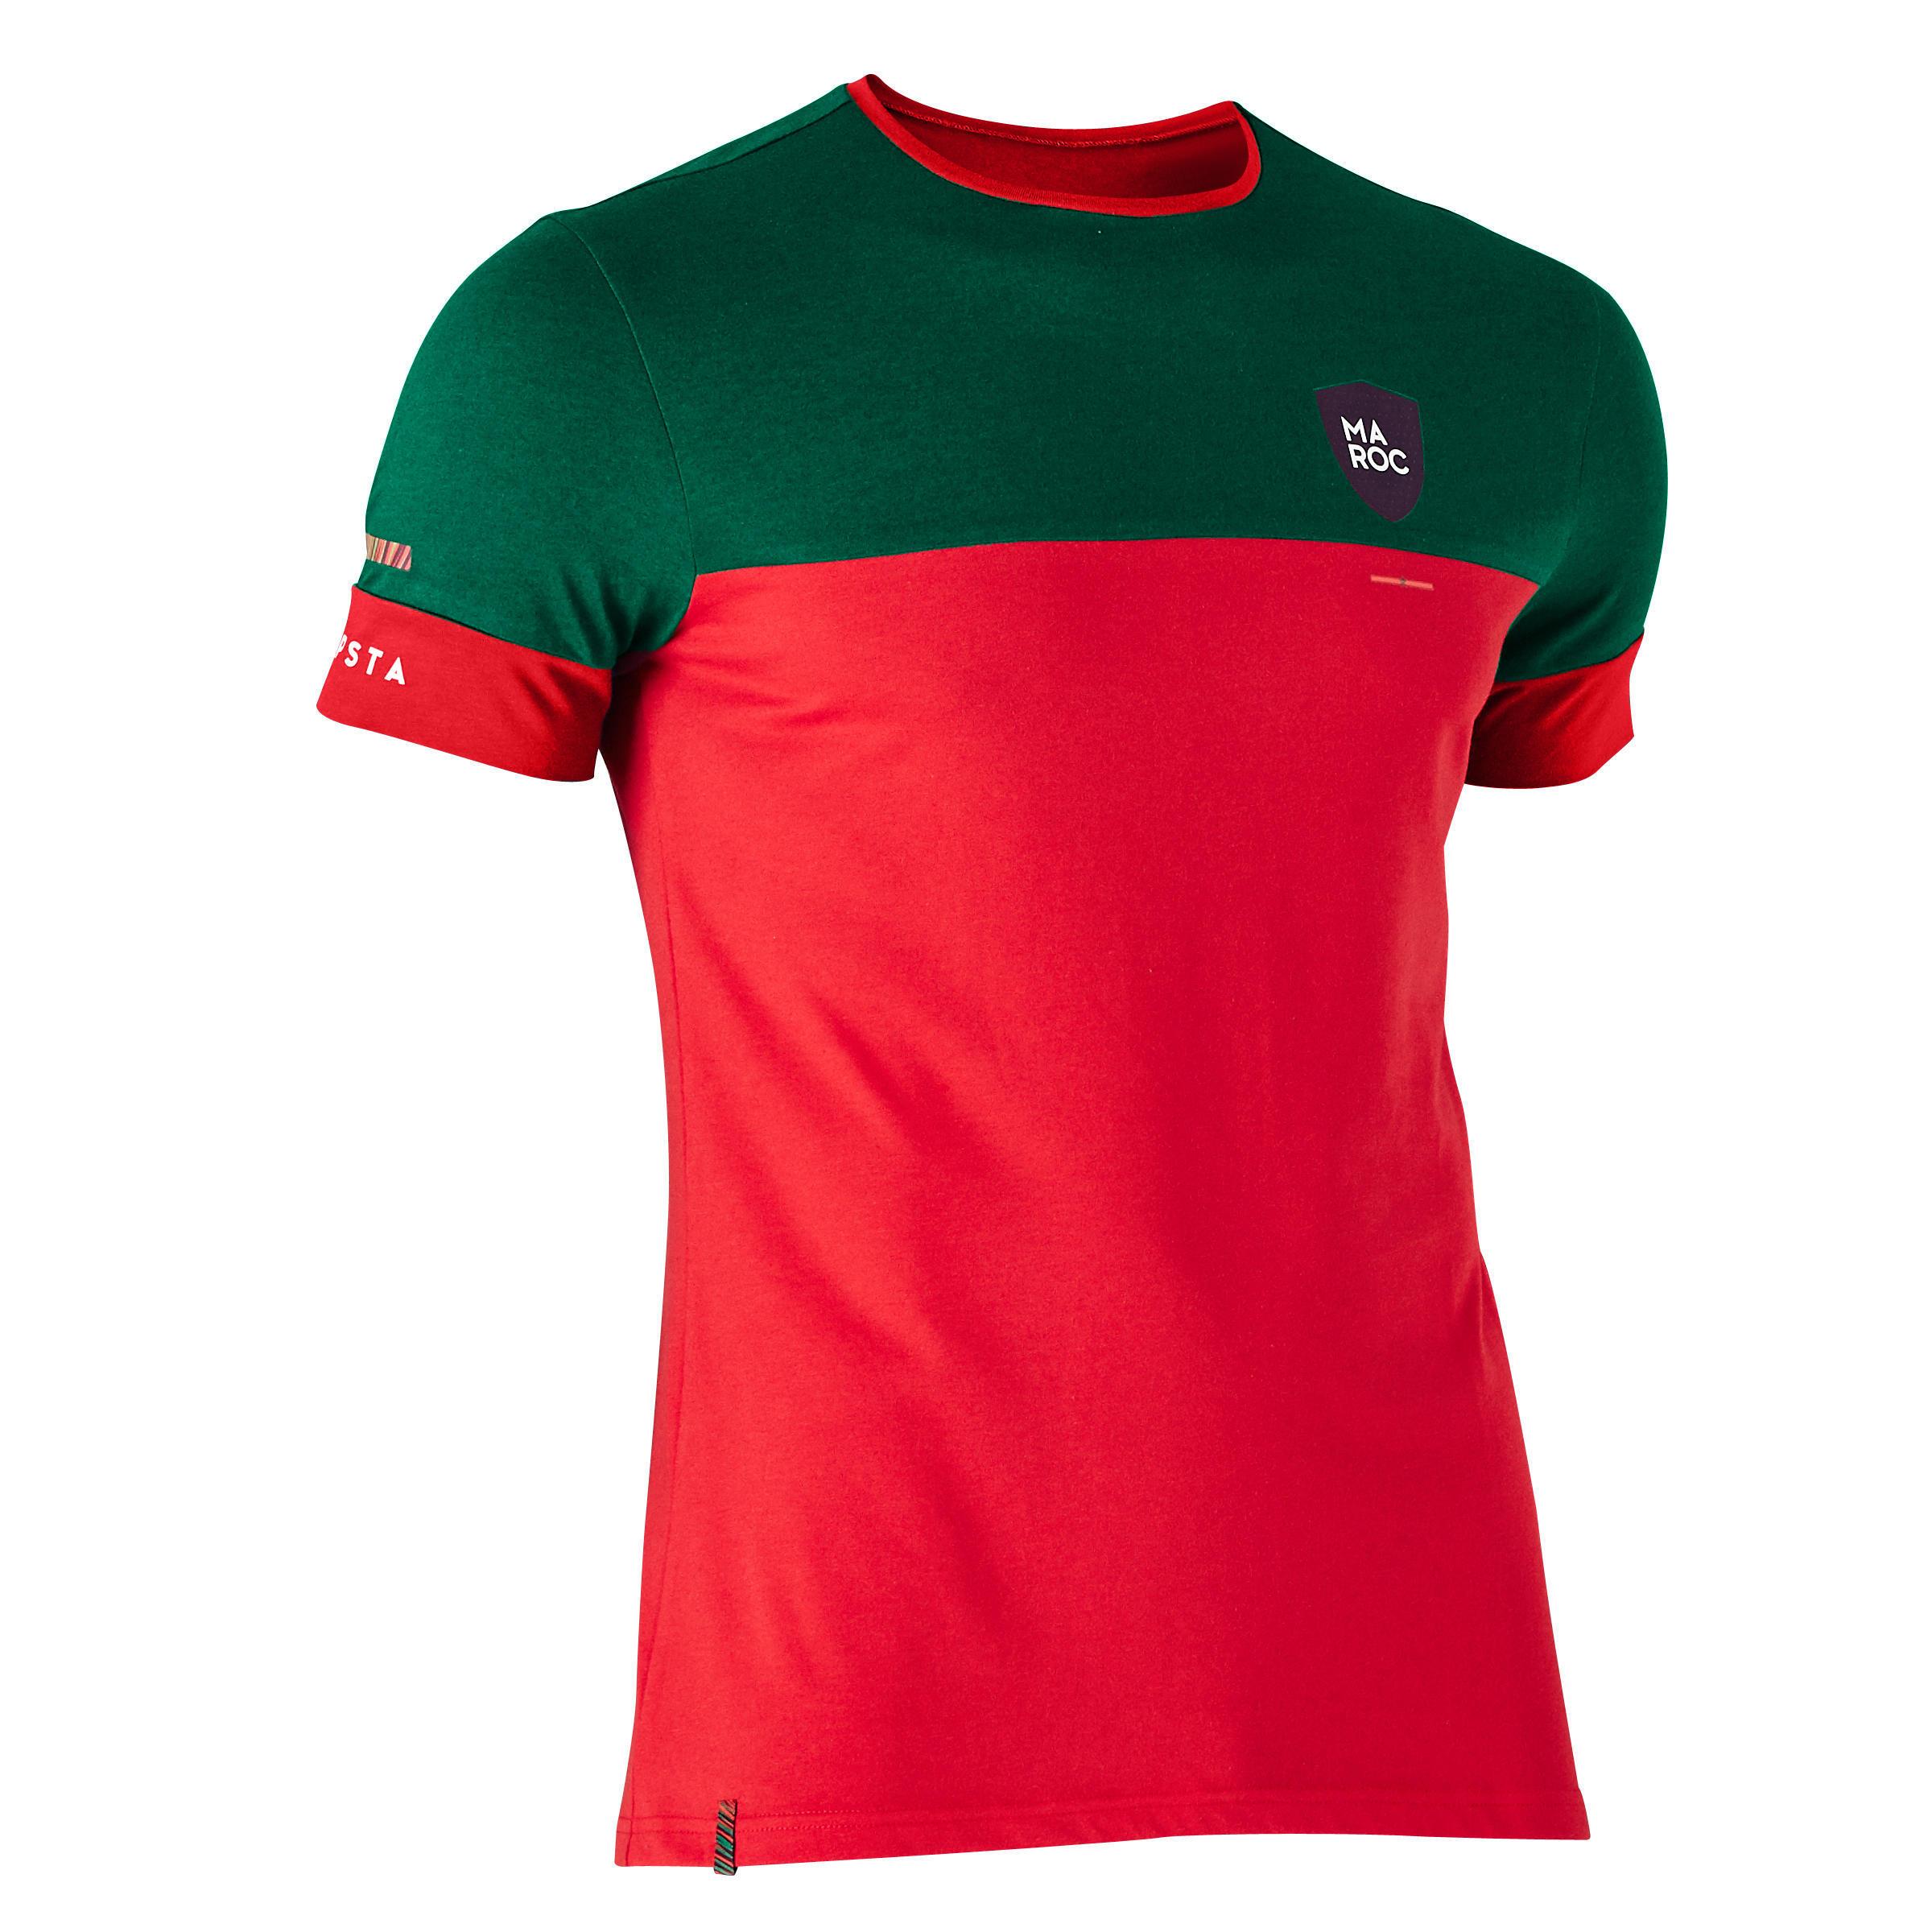 Kipsta T-shirt de football adulte FF100 Maroc - Kipsta